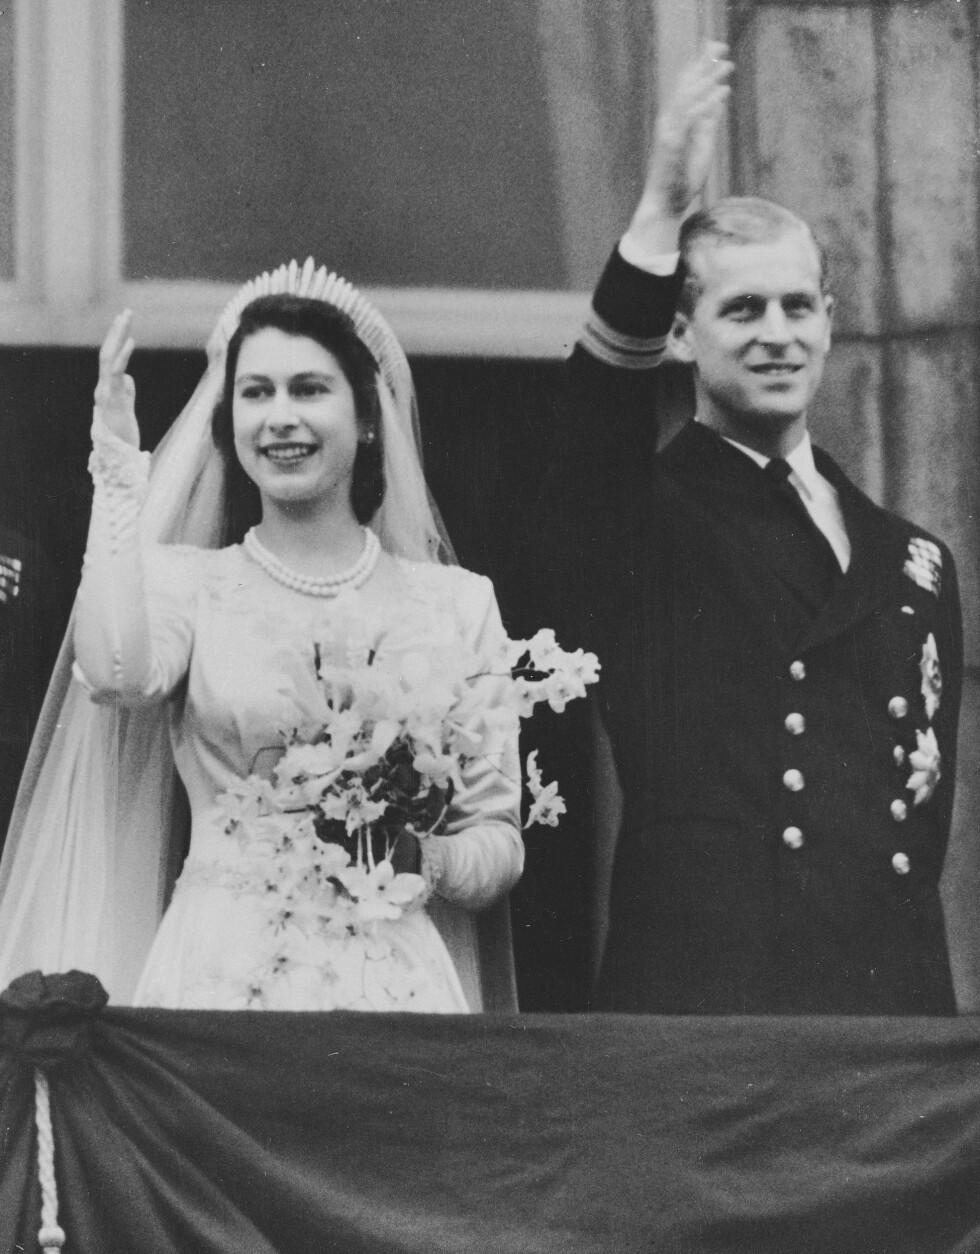 ET KONGELIG VINK: De nygifte på Buckingham palace. Foto: NTB Scanpix